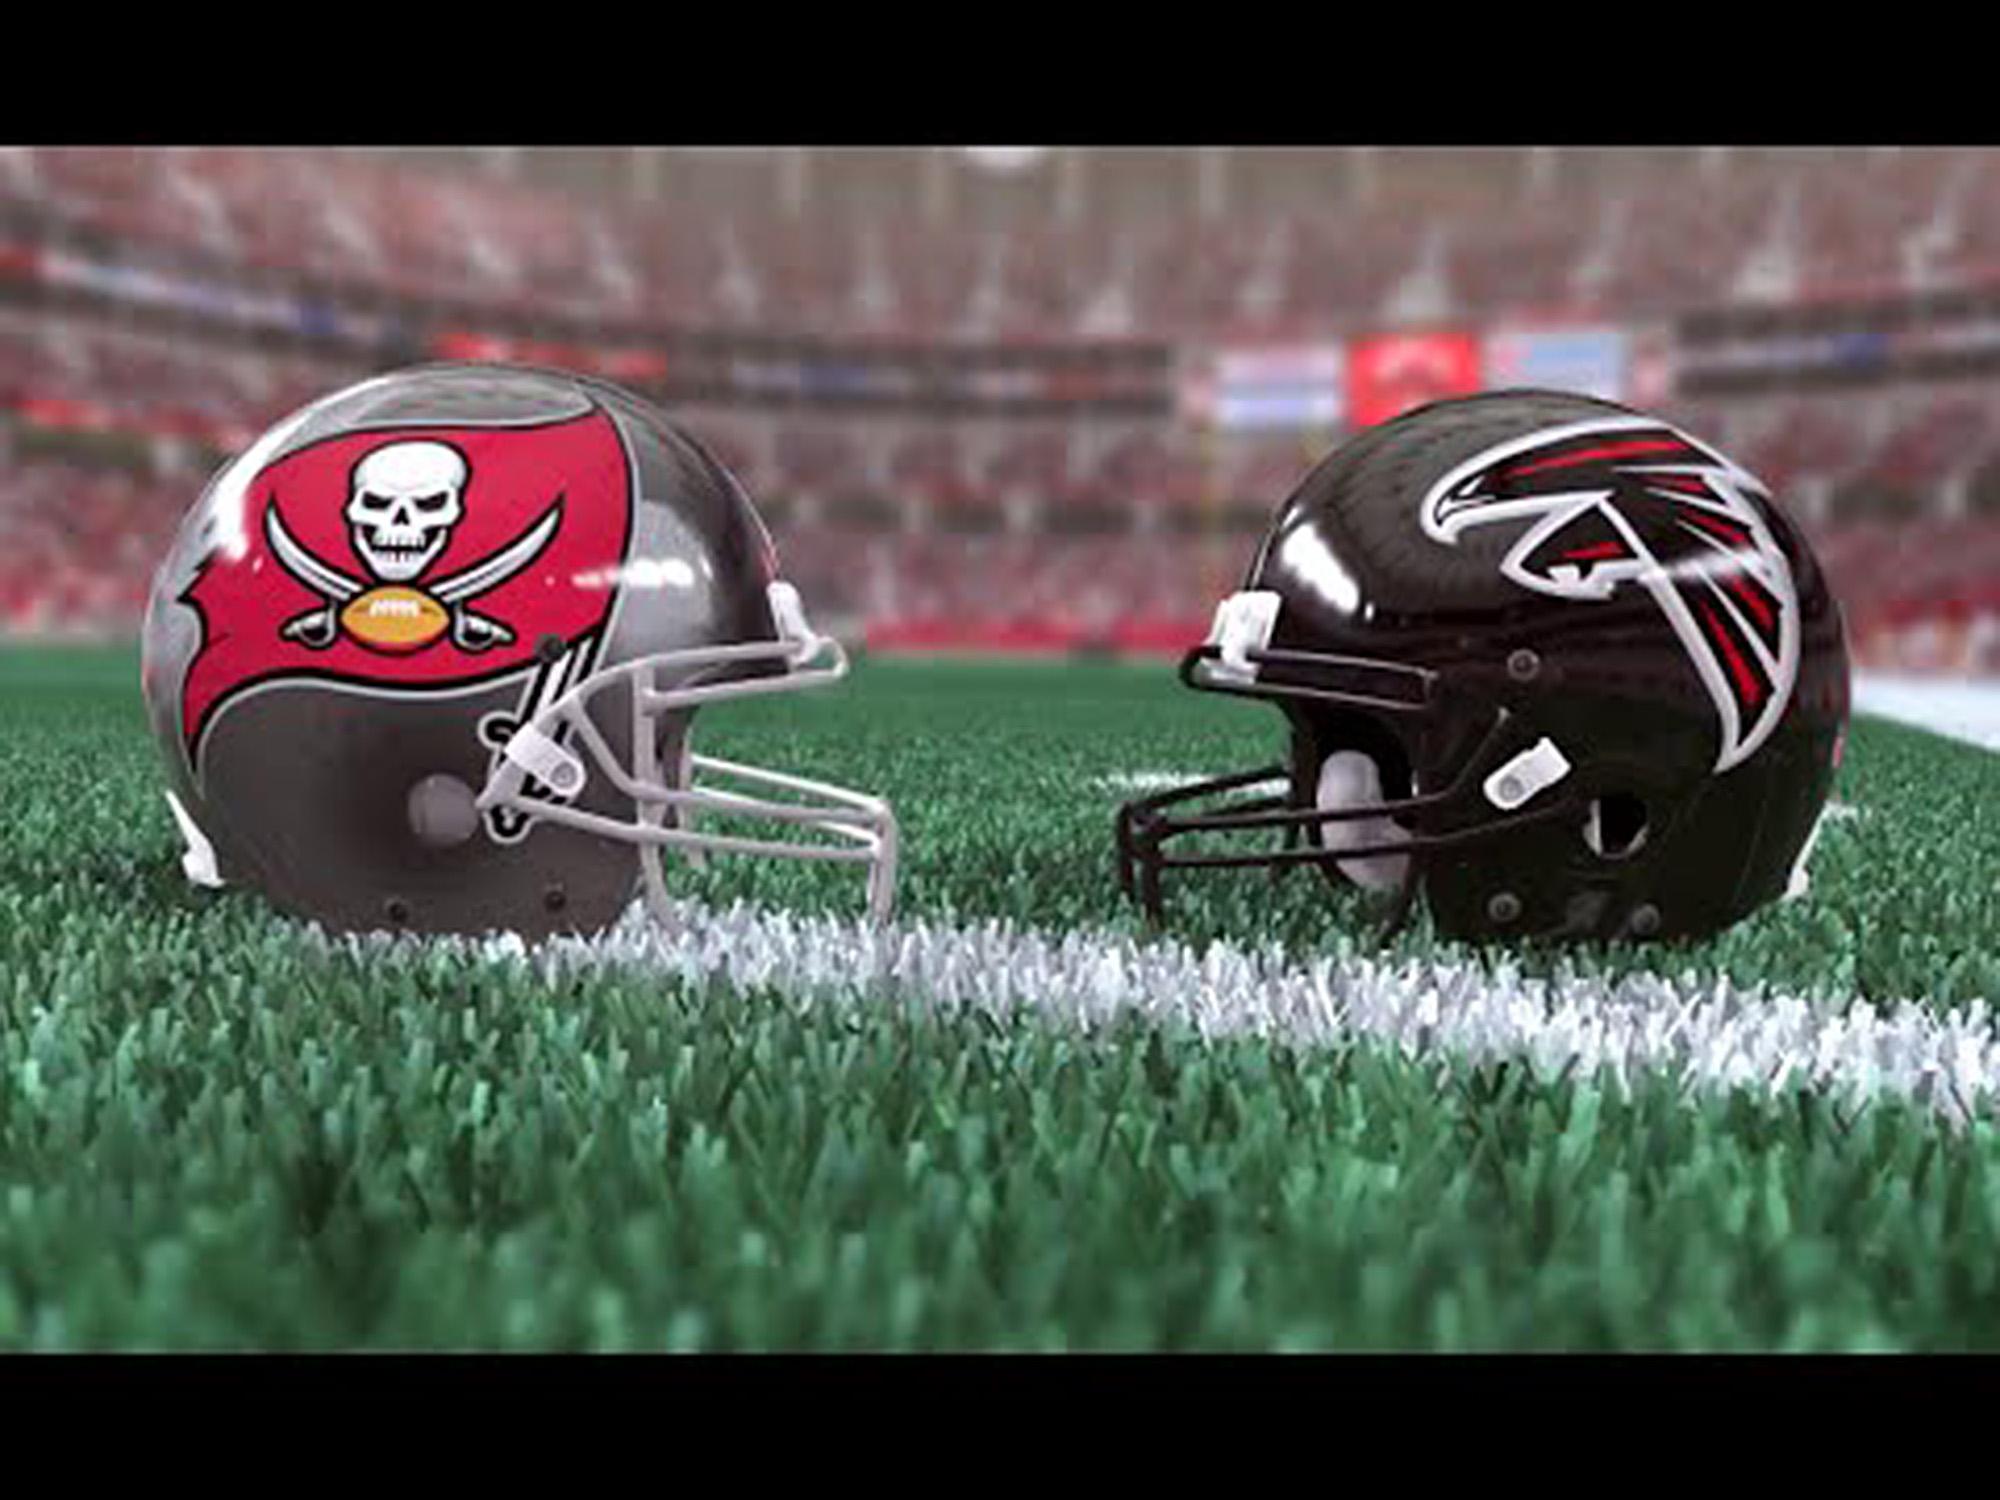 Falcons Vs. Buccaneers On Monday Night Football